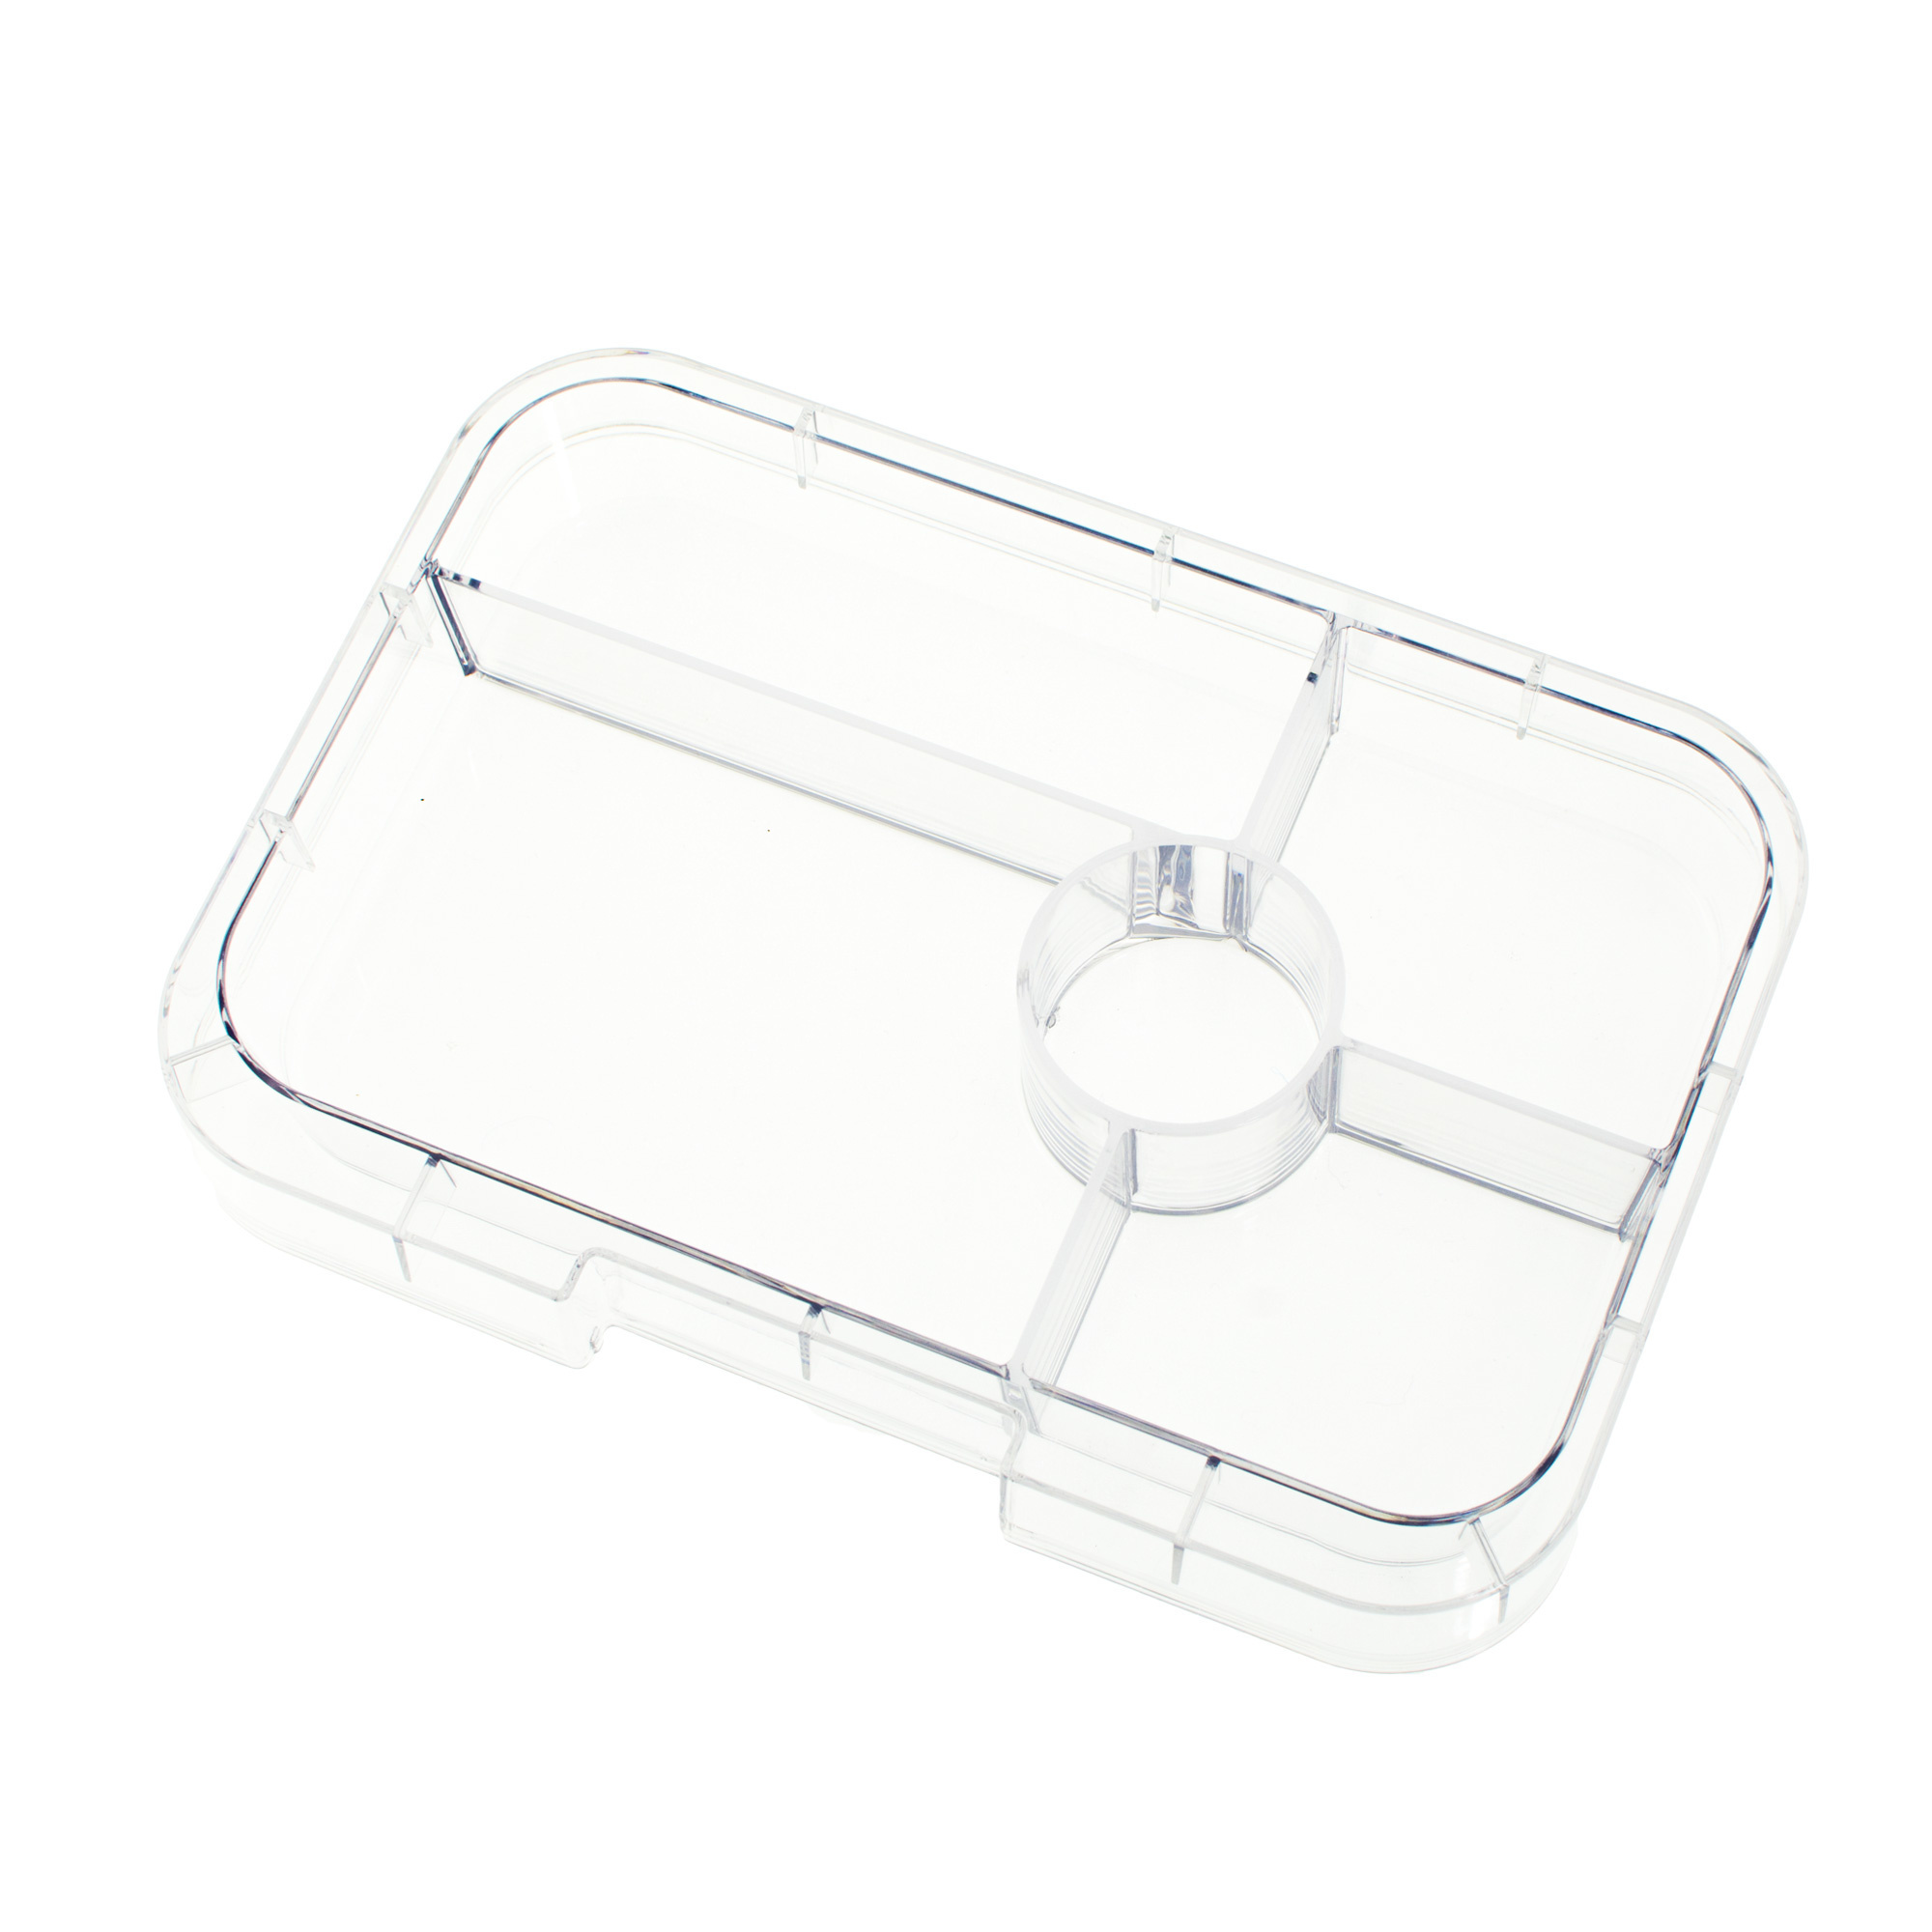 Yumbox Tapas tray 5-sections Transparant-1